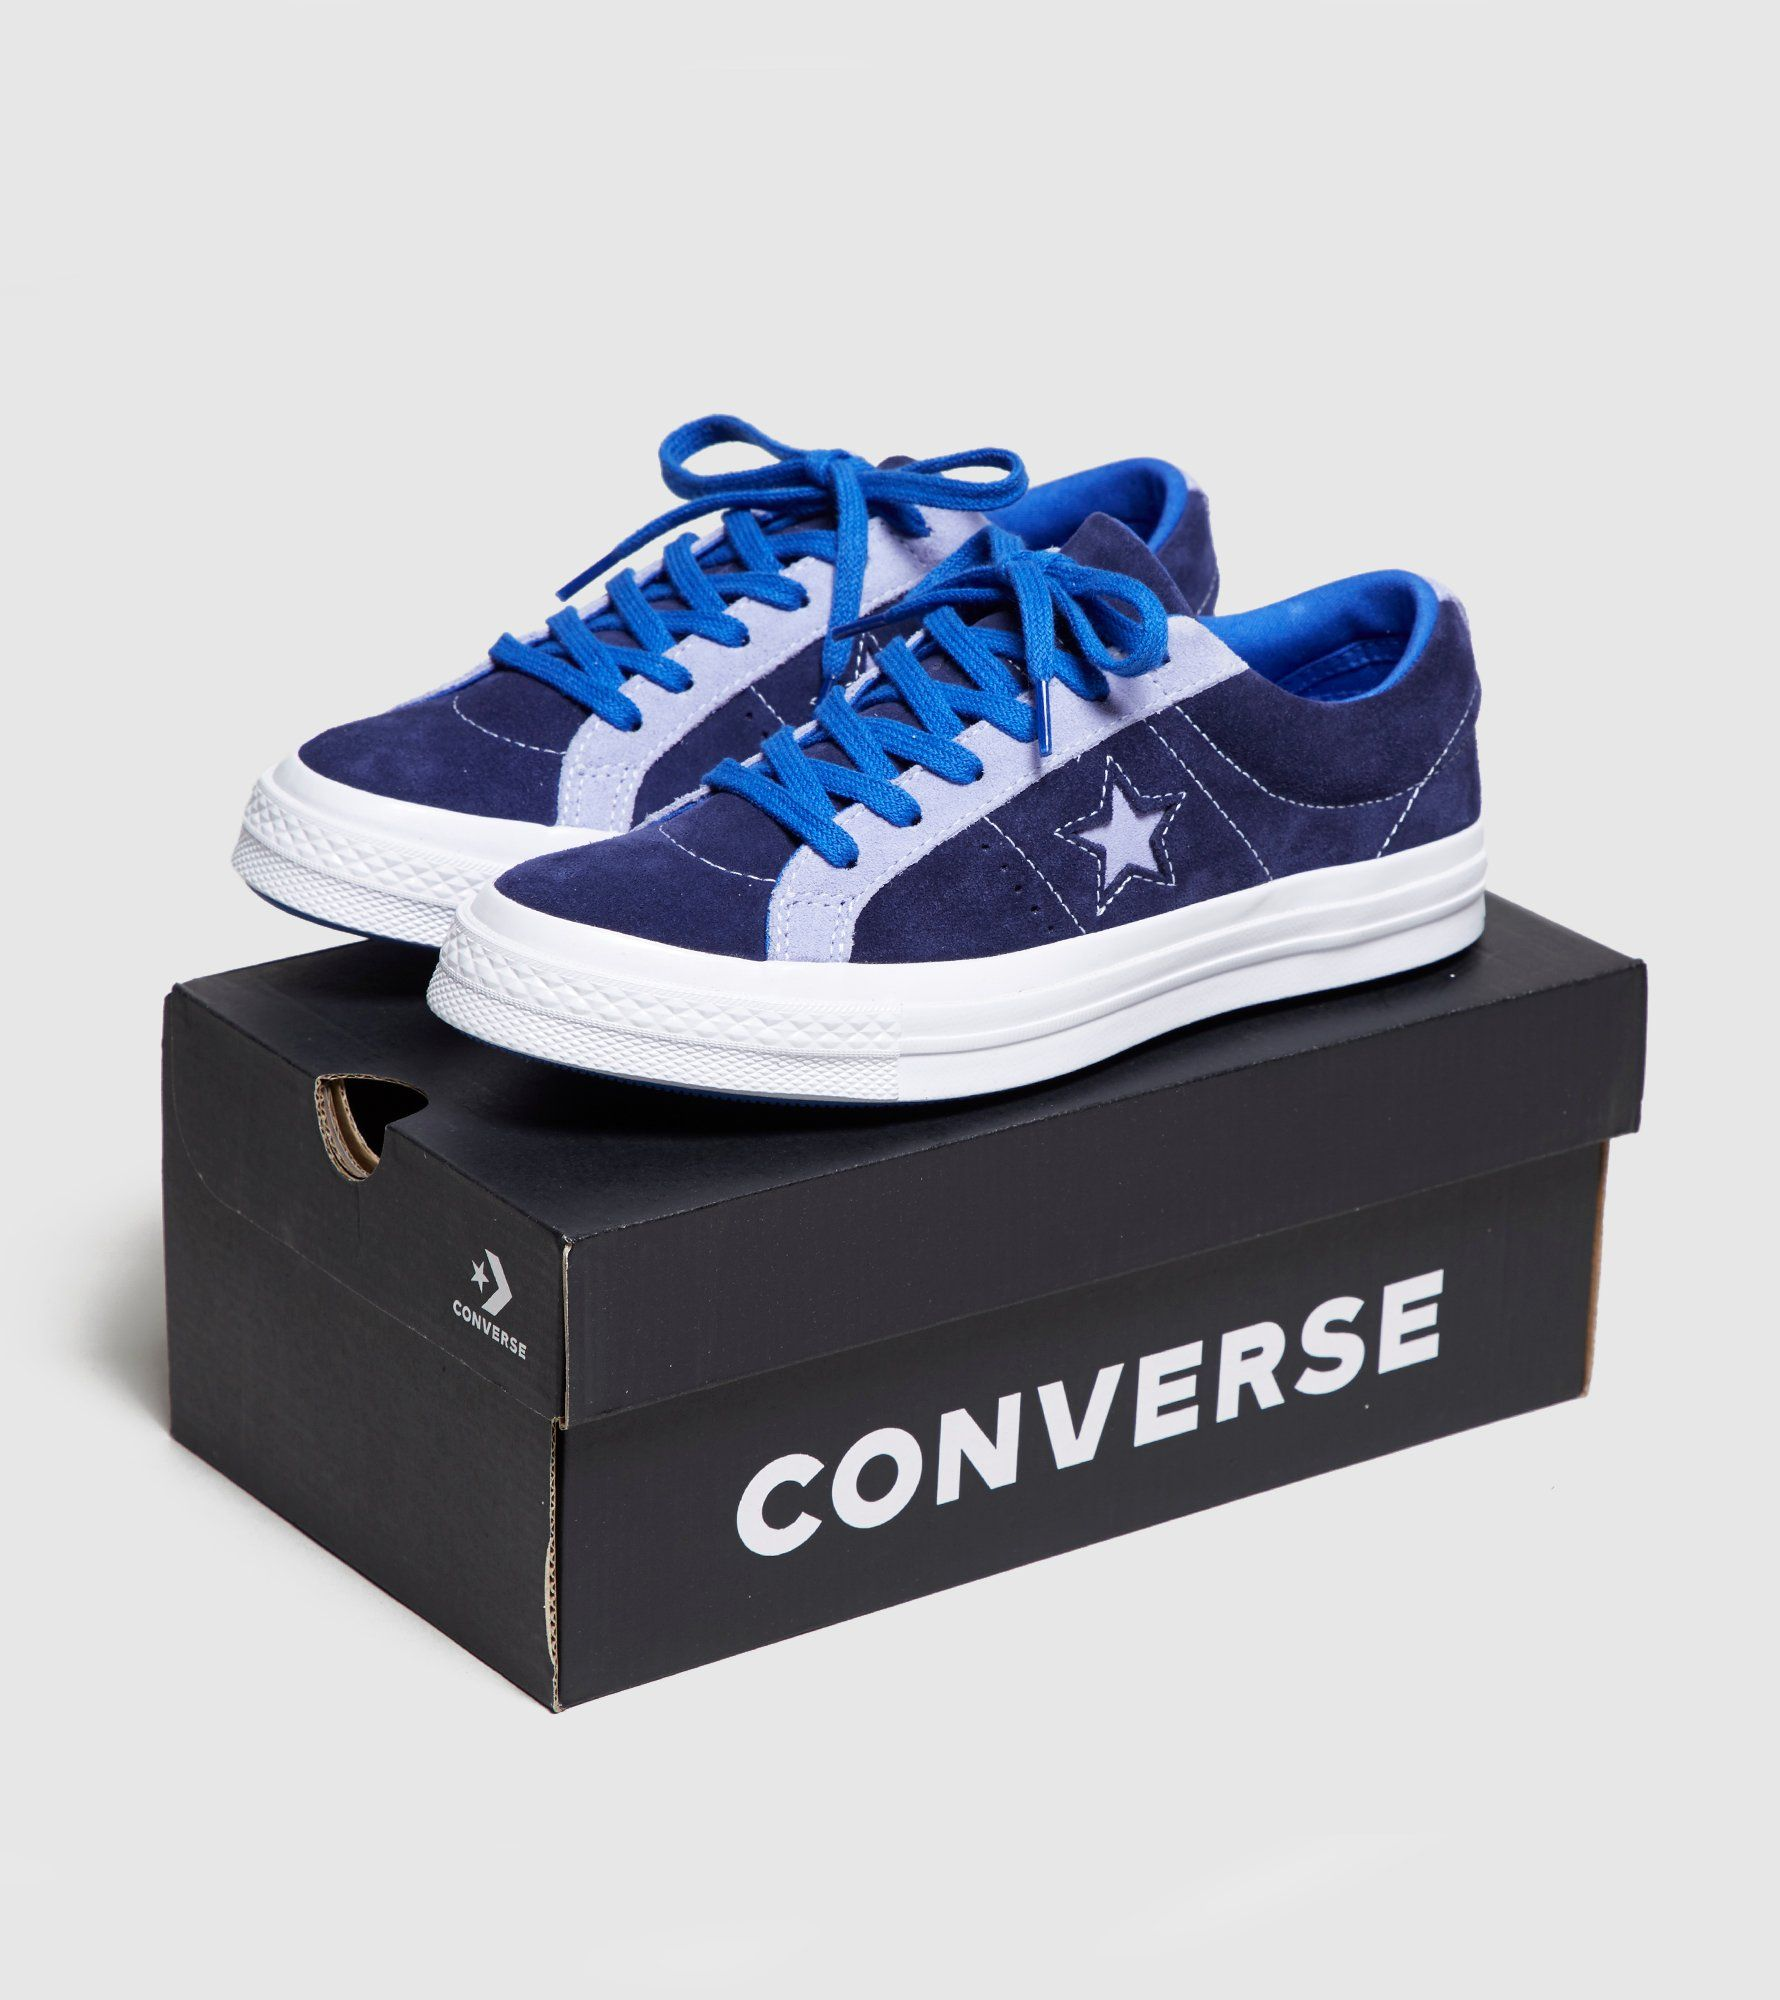 Converse One Star Femme